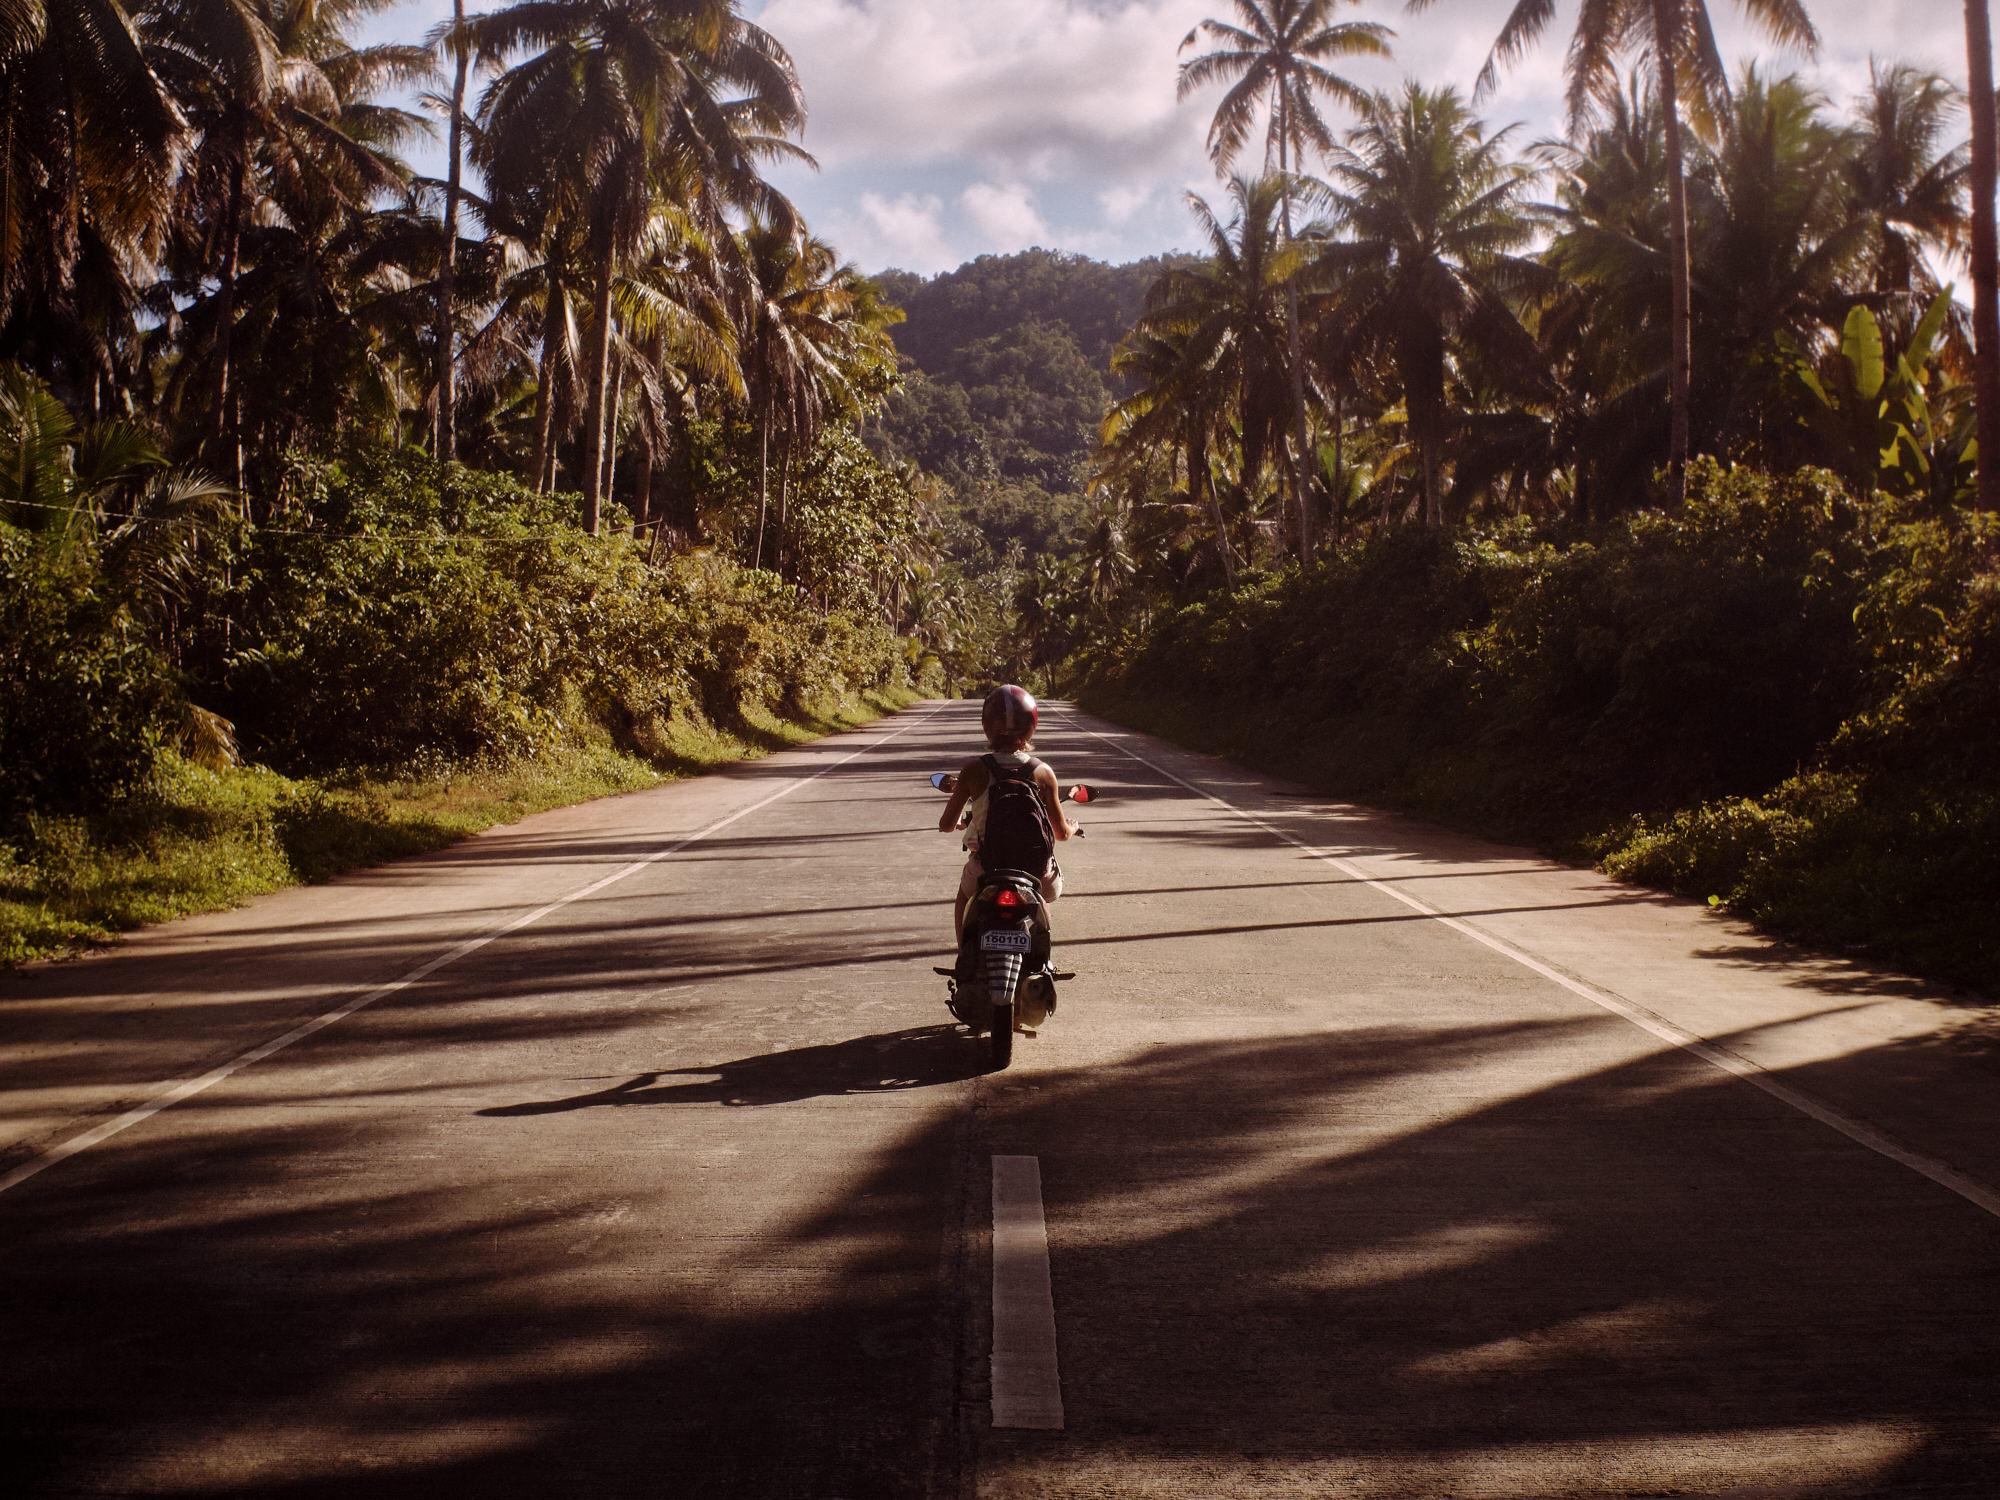 09_TRAVEL PHILIPPINES_LLR_4129